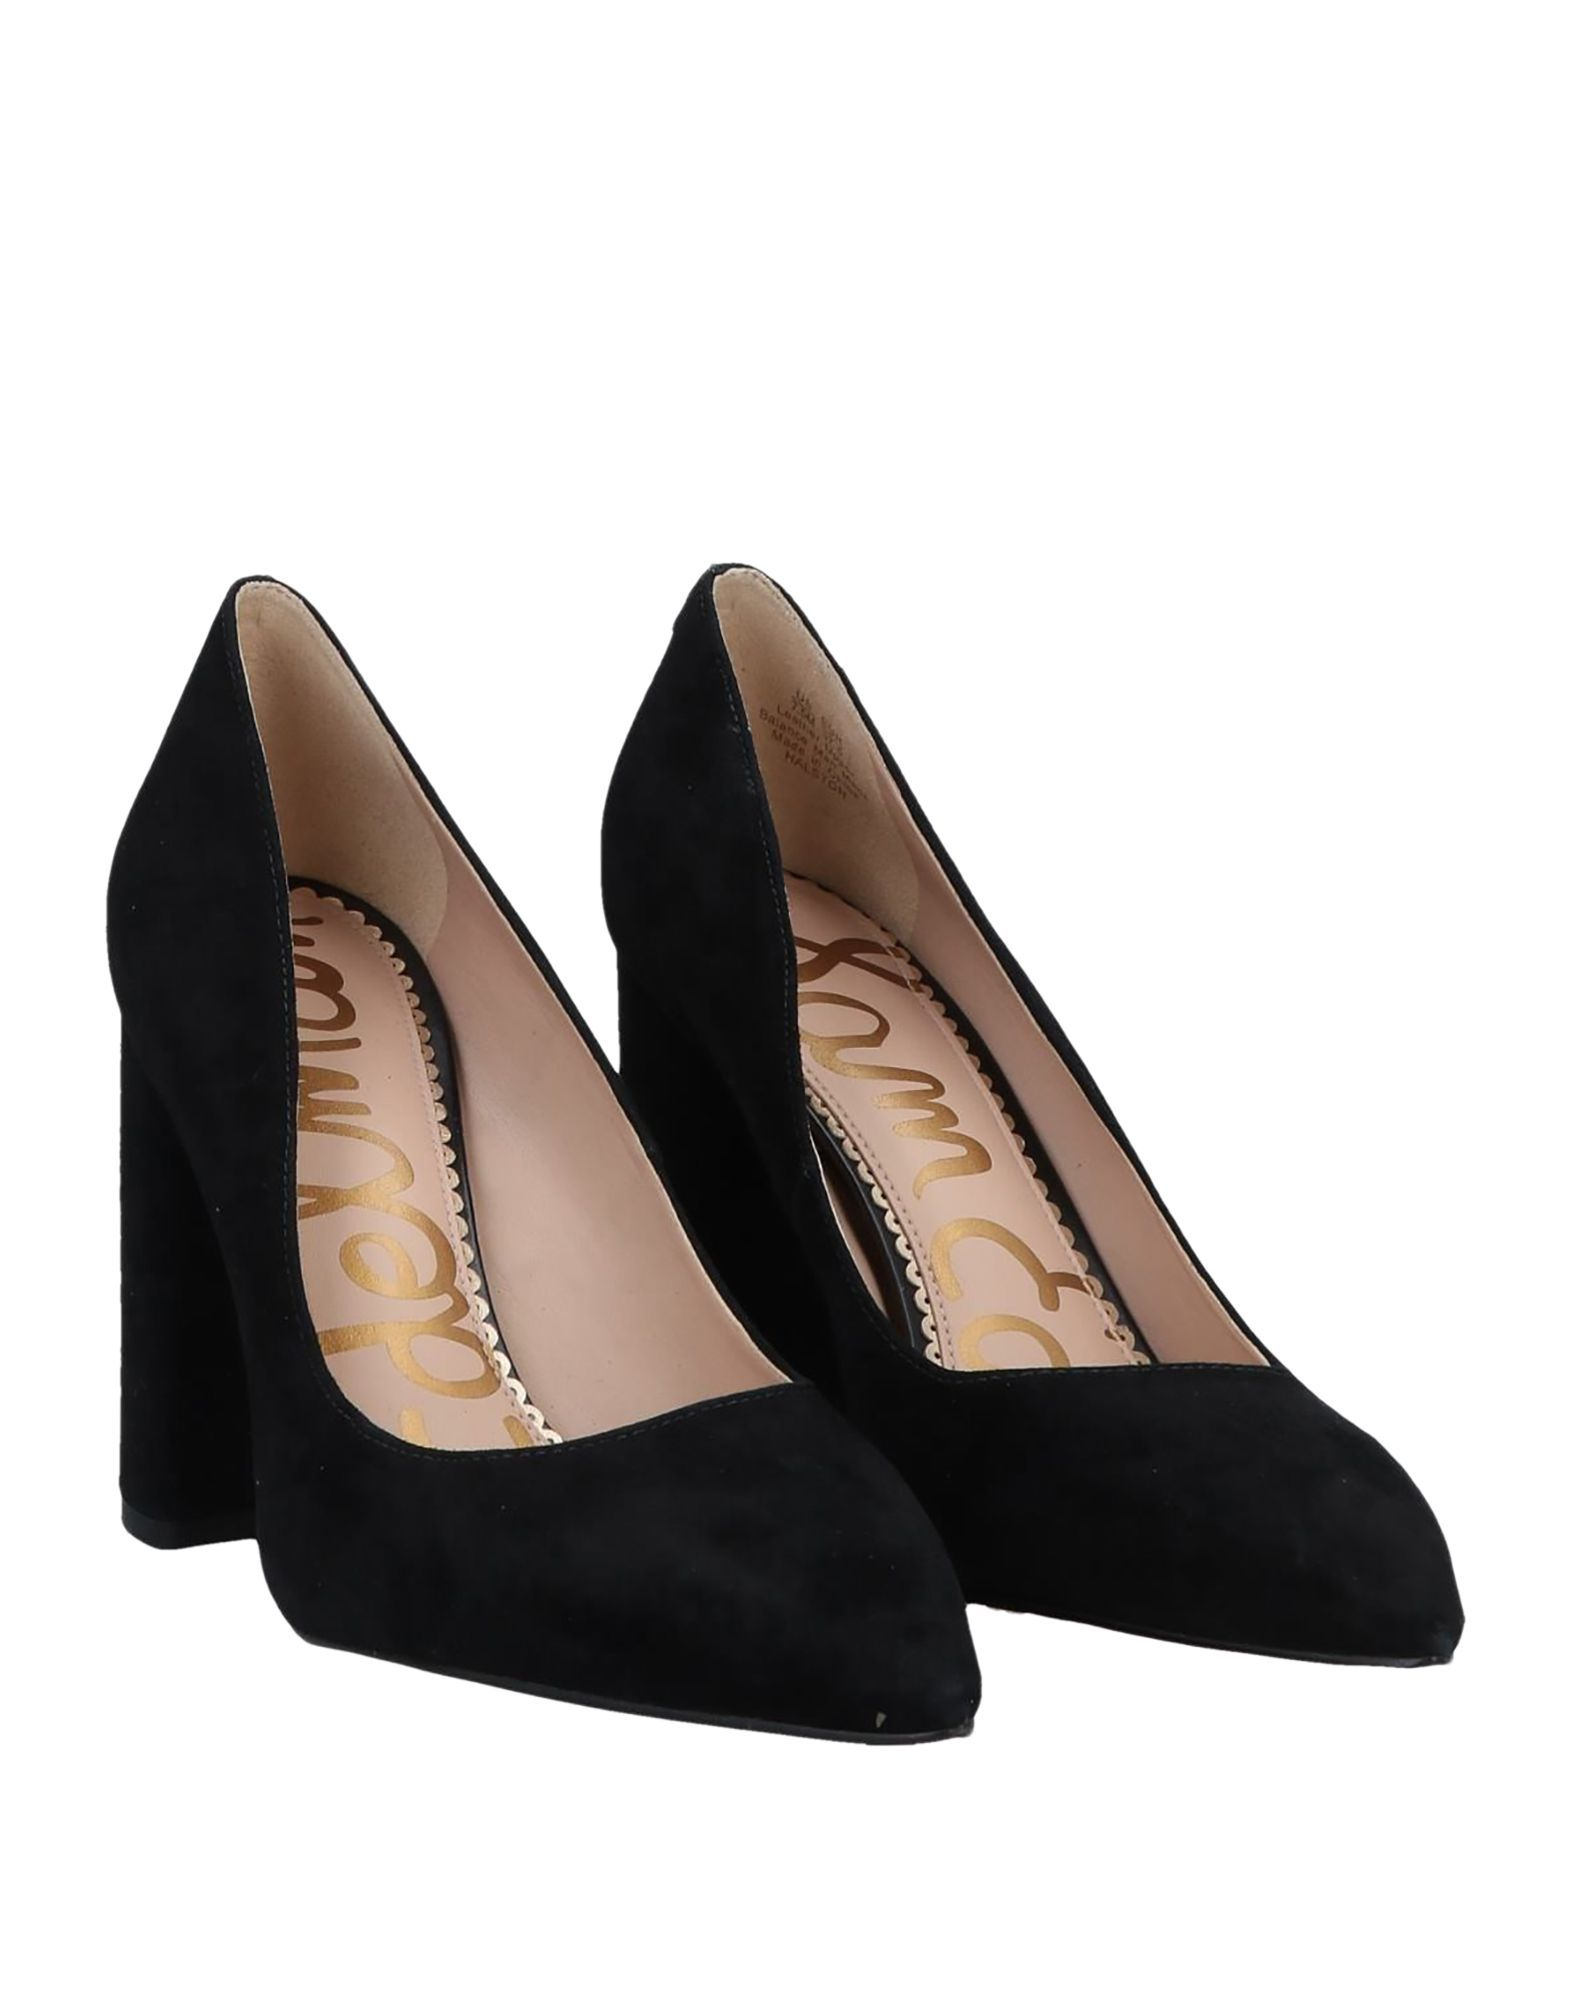 Sam Edelman Black Leather Court Shoe Heels